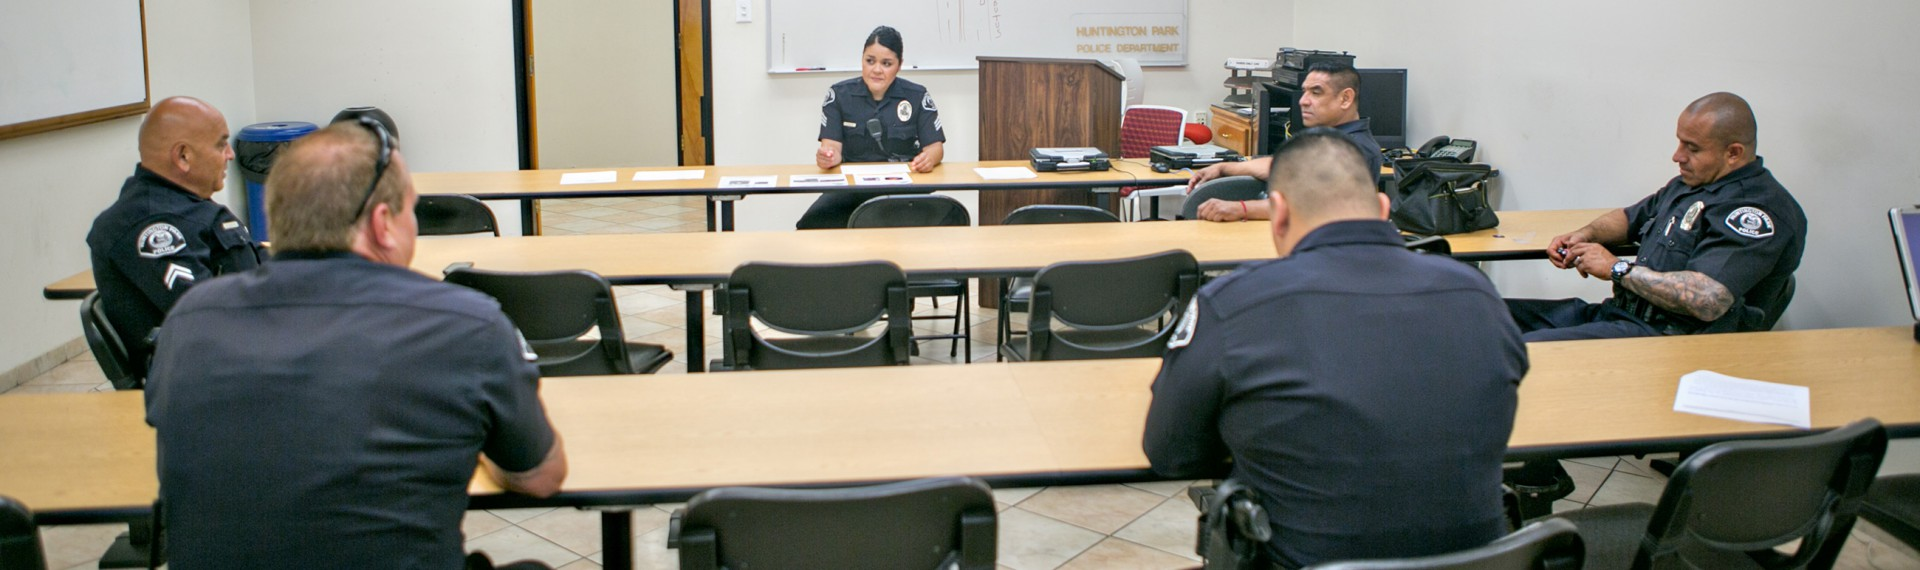 FAQs - Huntington Park Police Department